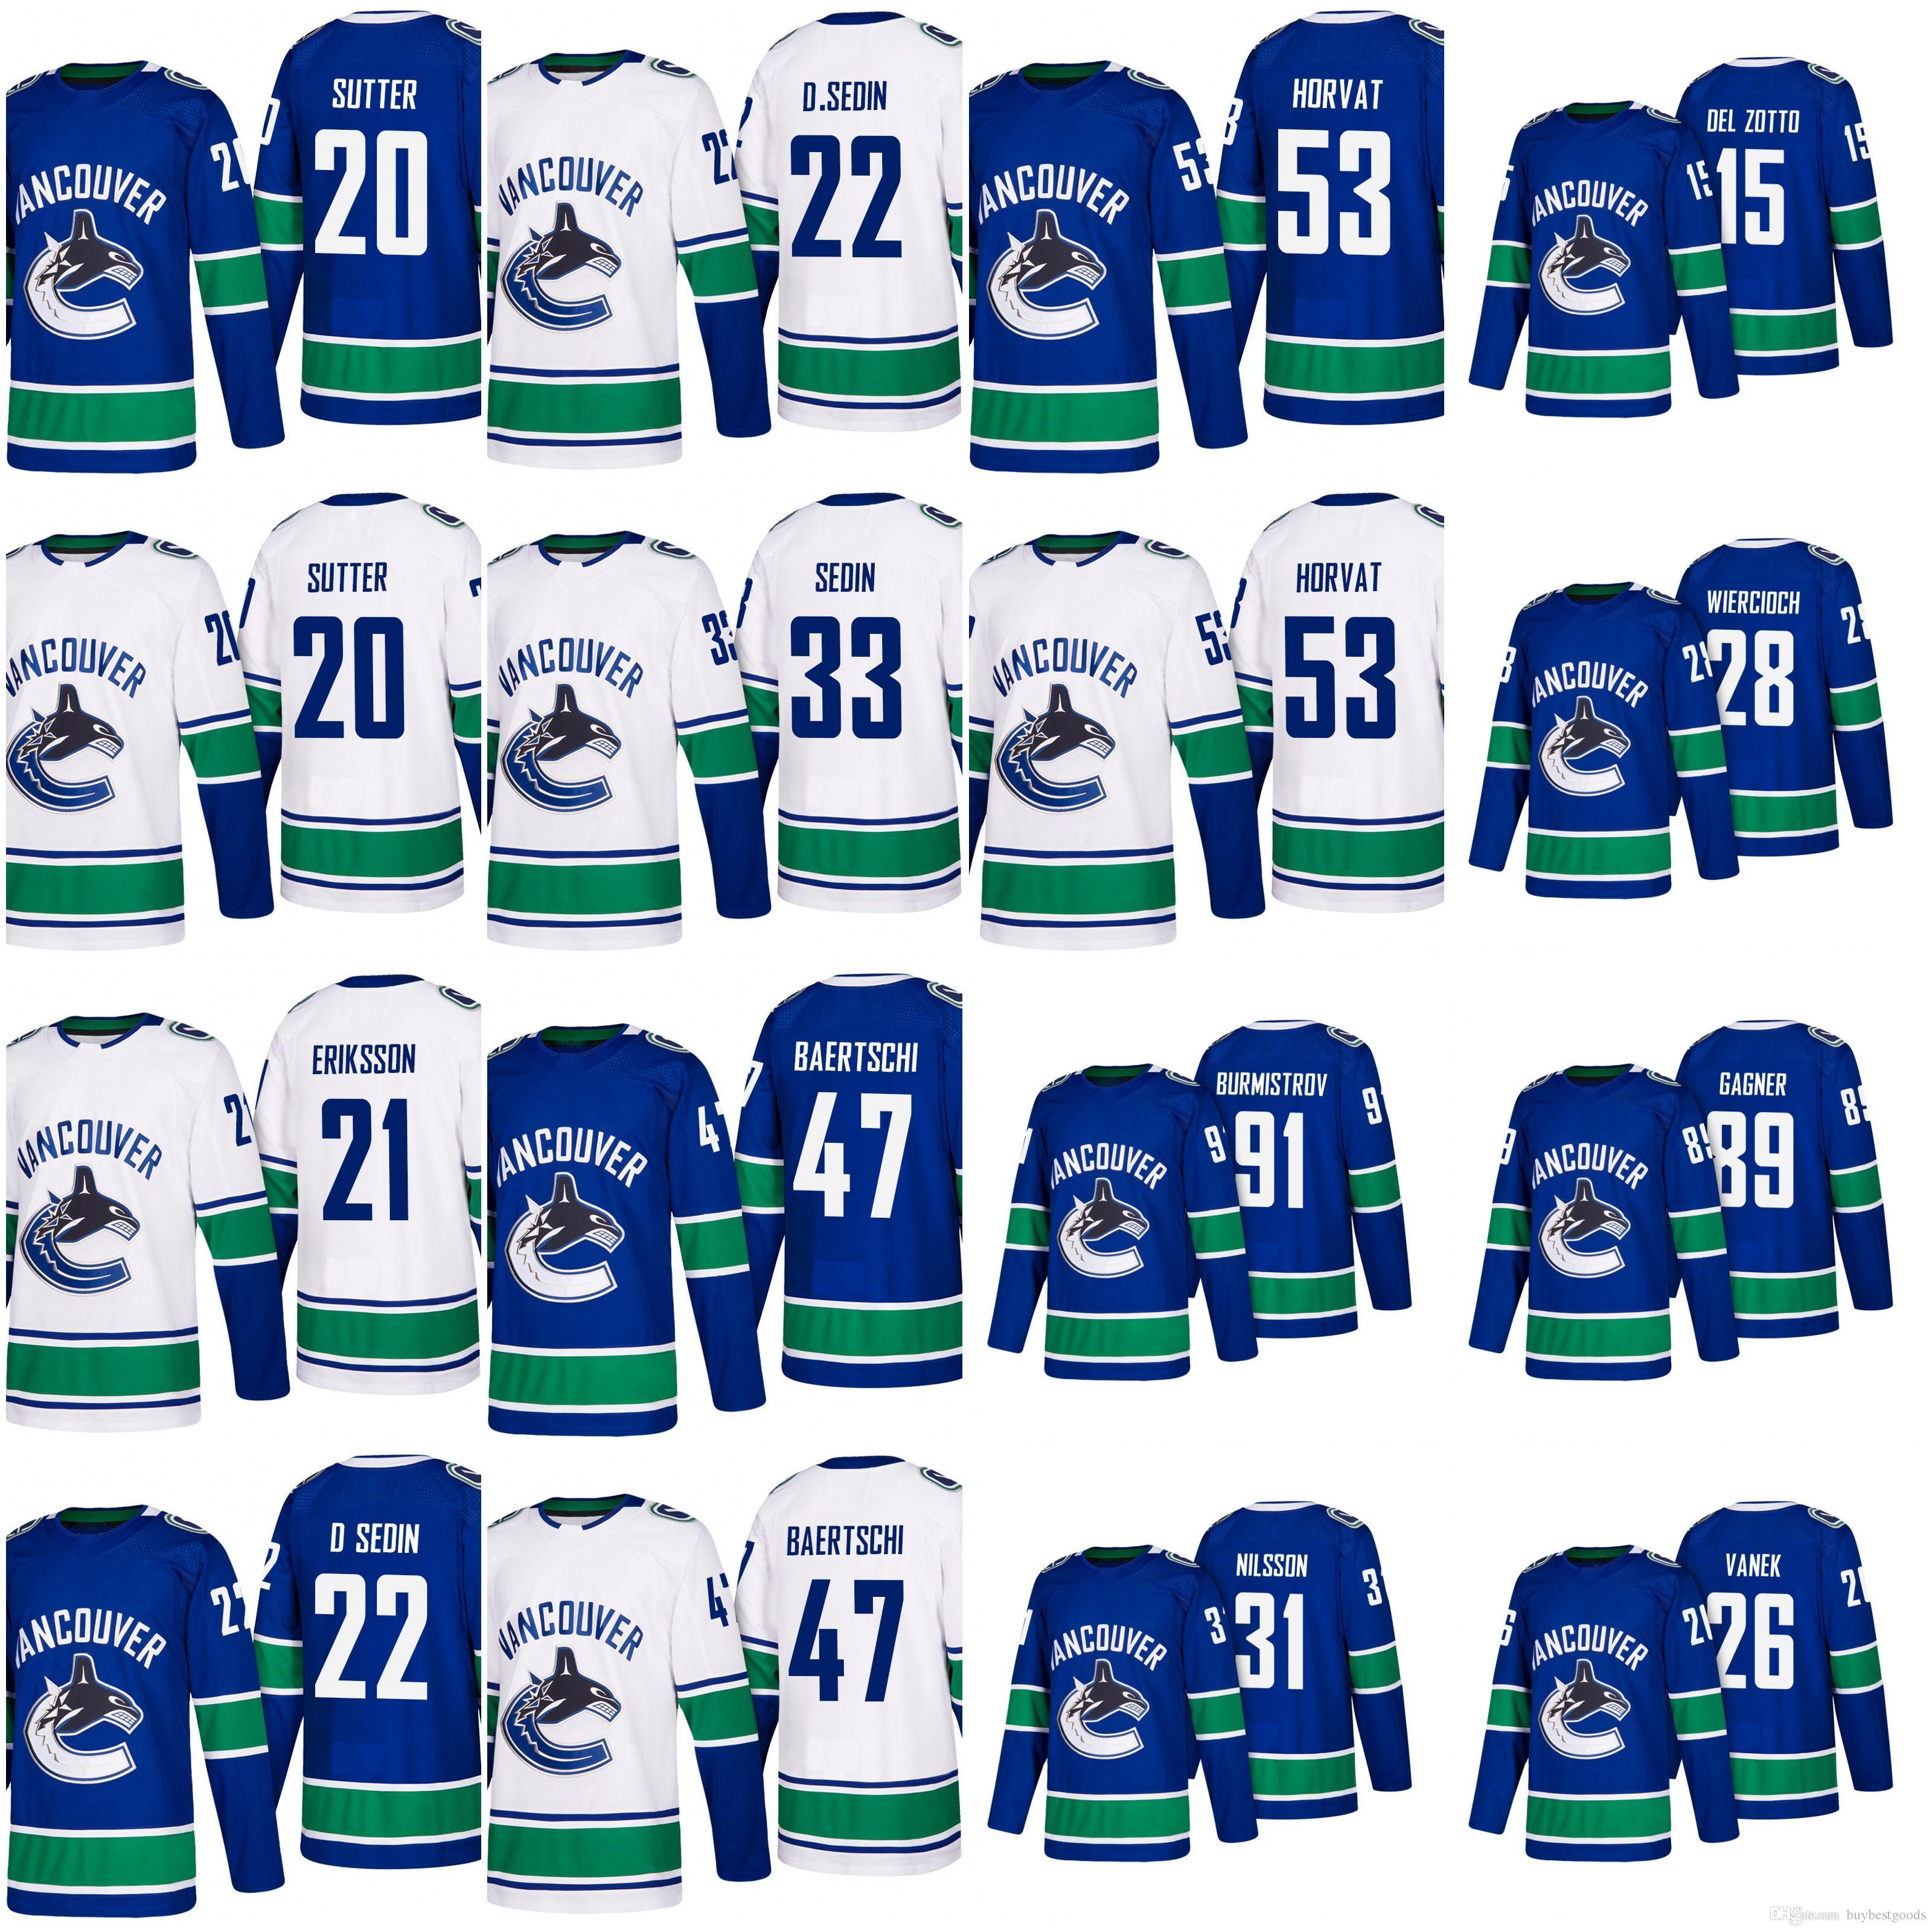 online cheap 2018 vancouver canucks hockey jerseys 22 daniel sedin 33 henrik sedin 53 bo horvat